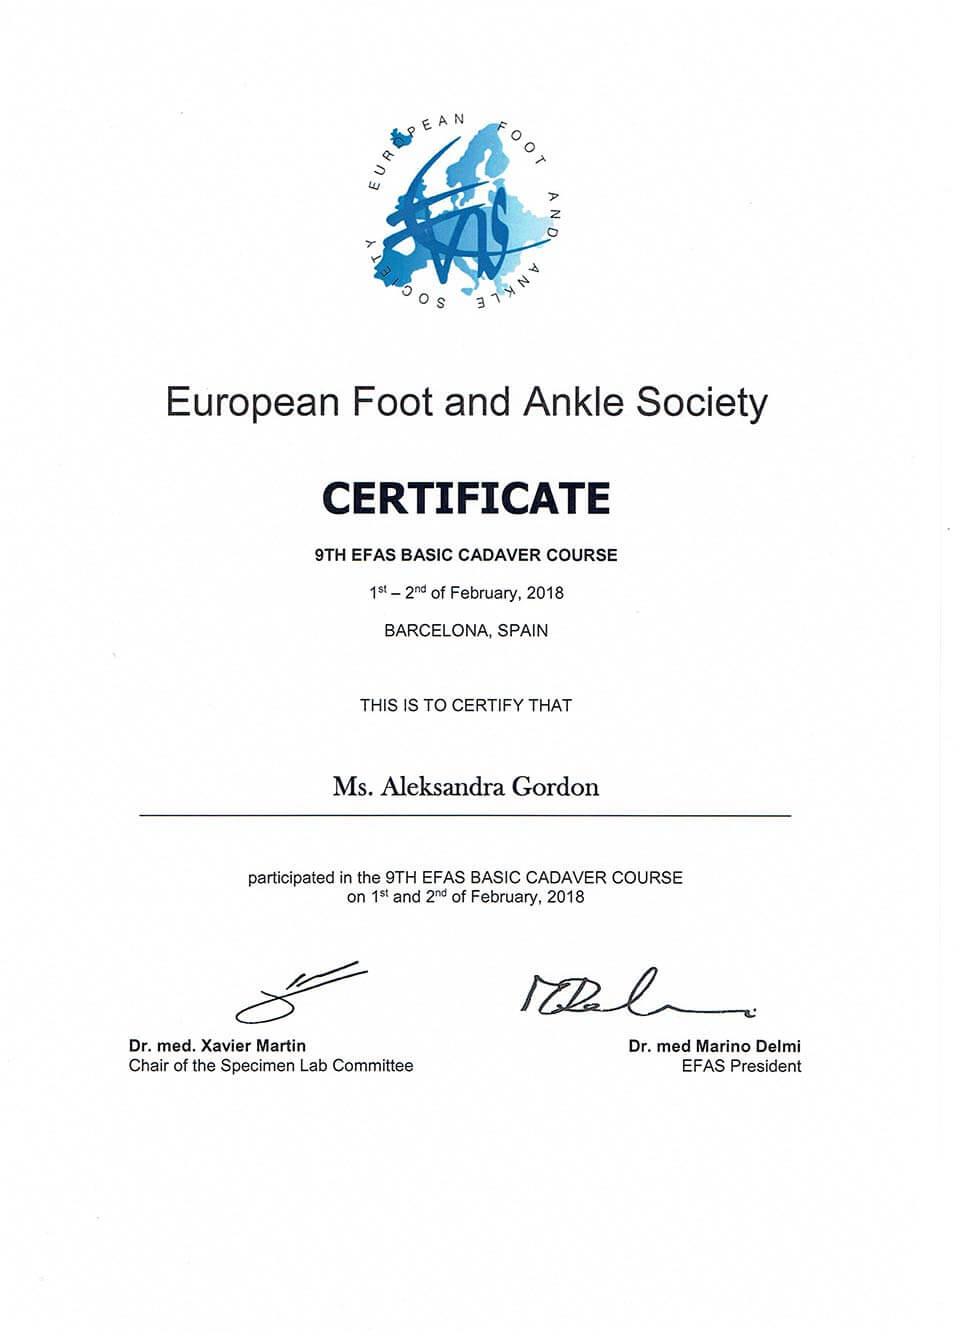 aleksandra-gordon-certyfika-dyplom (3)